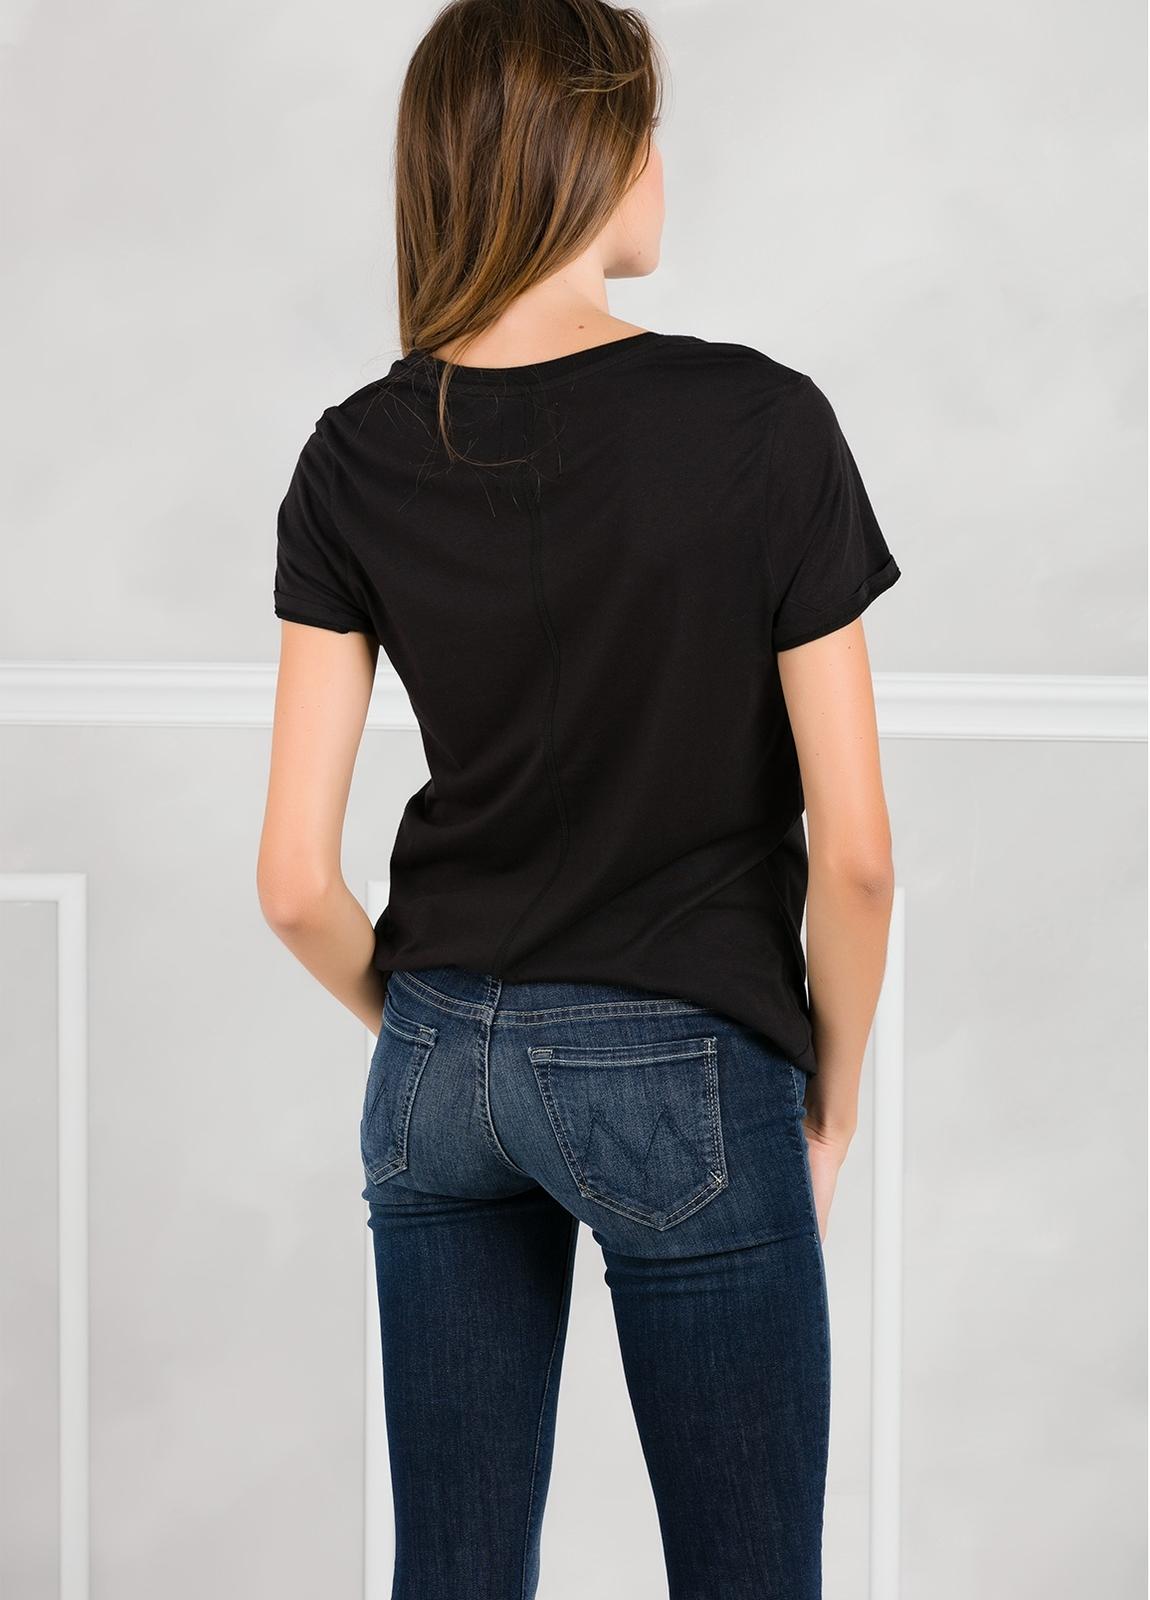 Camiseta manga corta color negro con motivo gráfico. 50% Algodón 50% Modal. - Ítem1